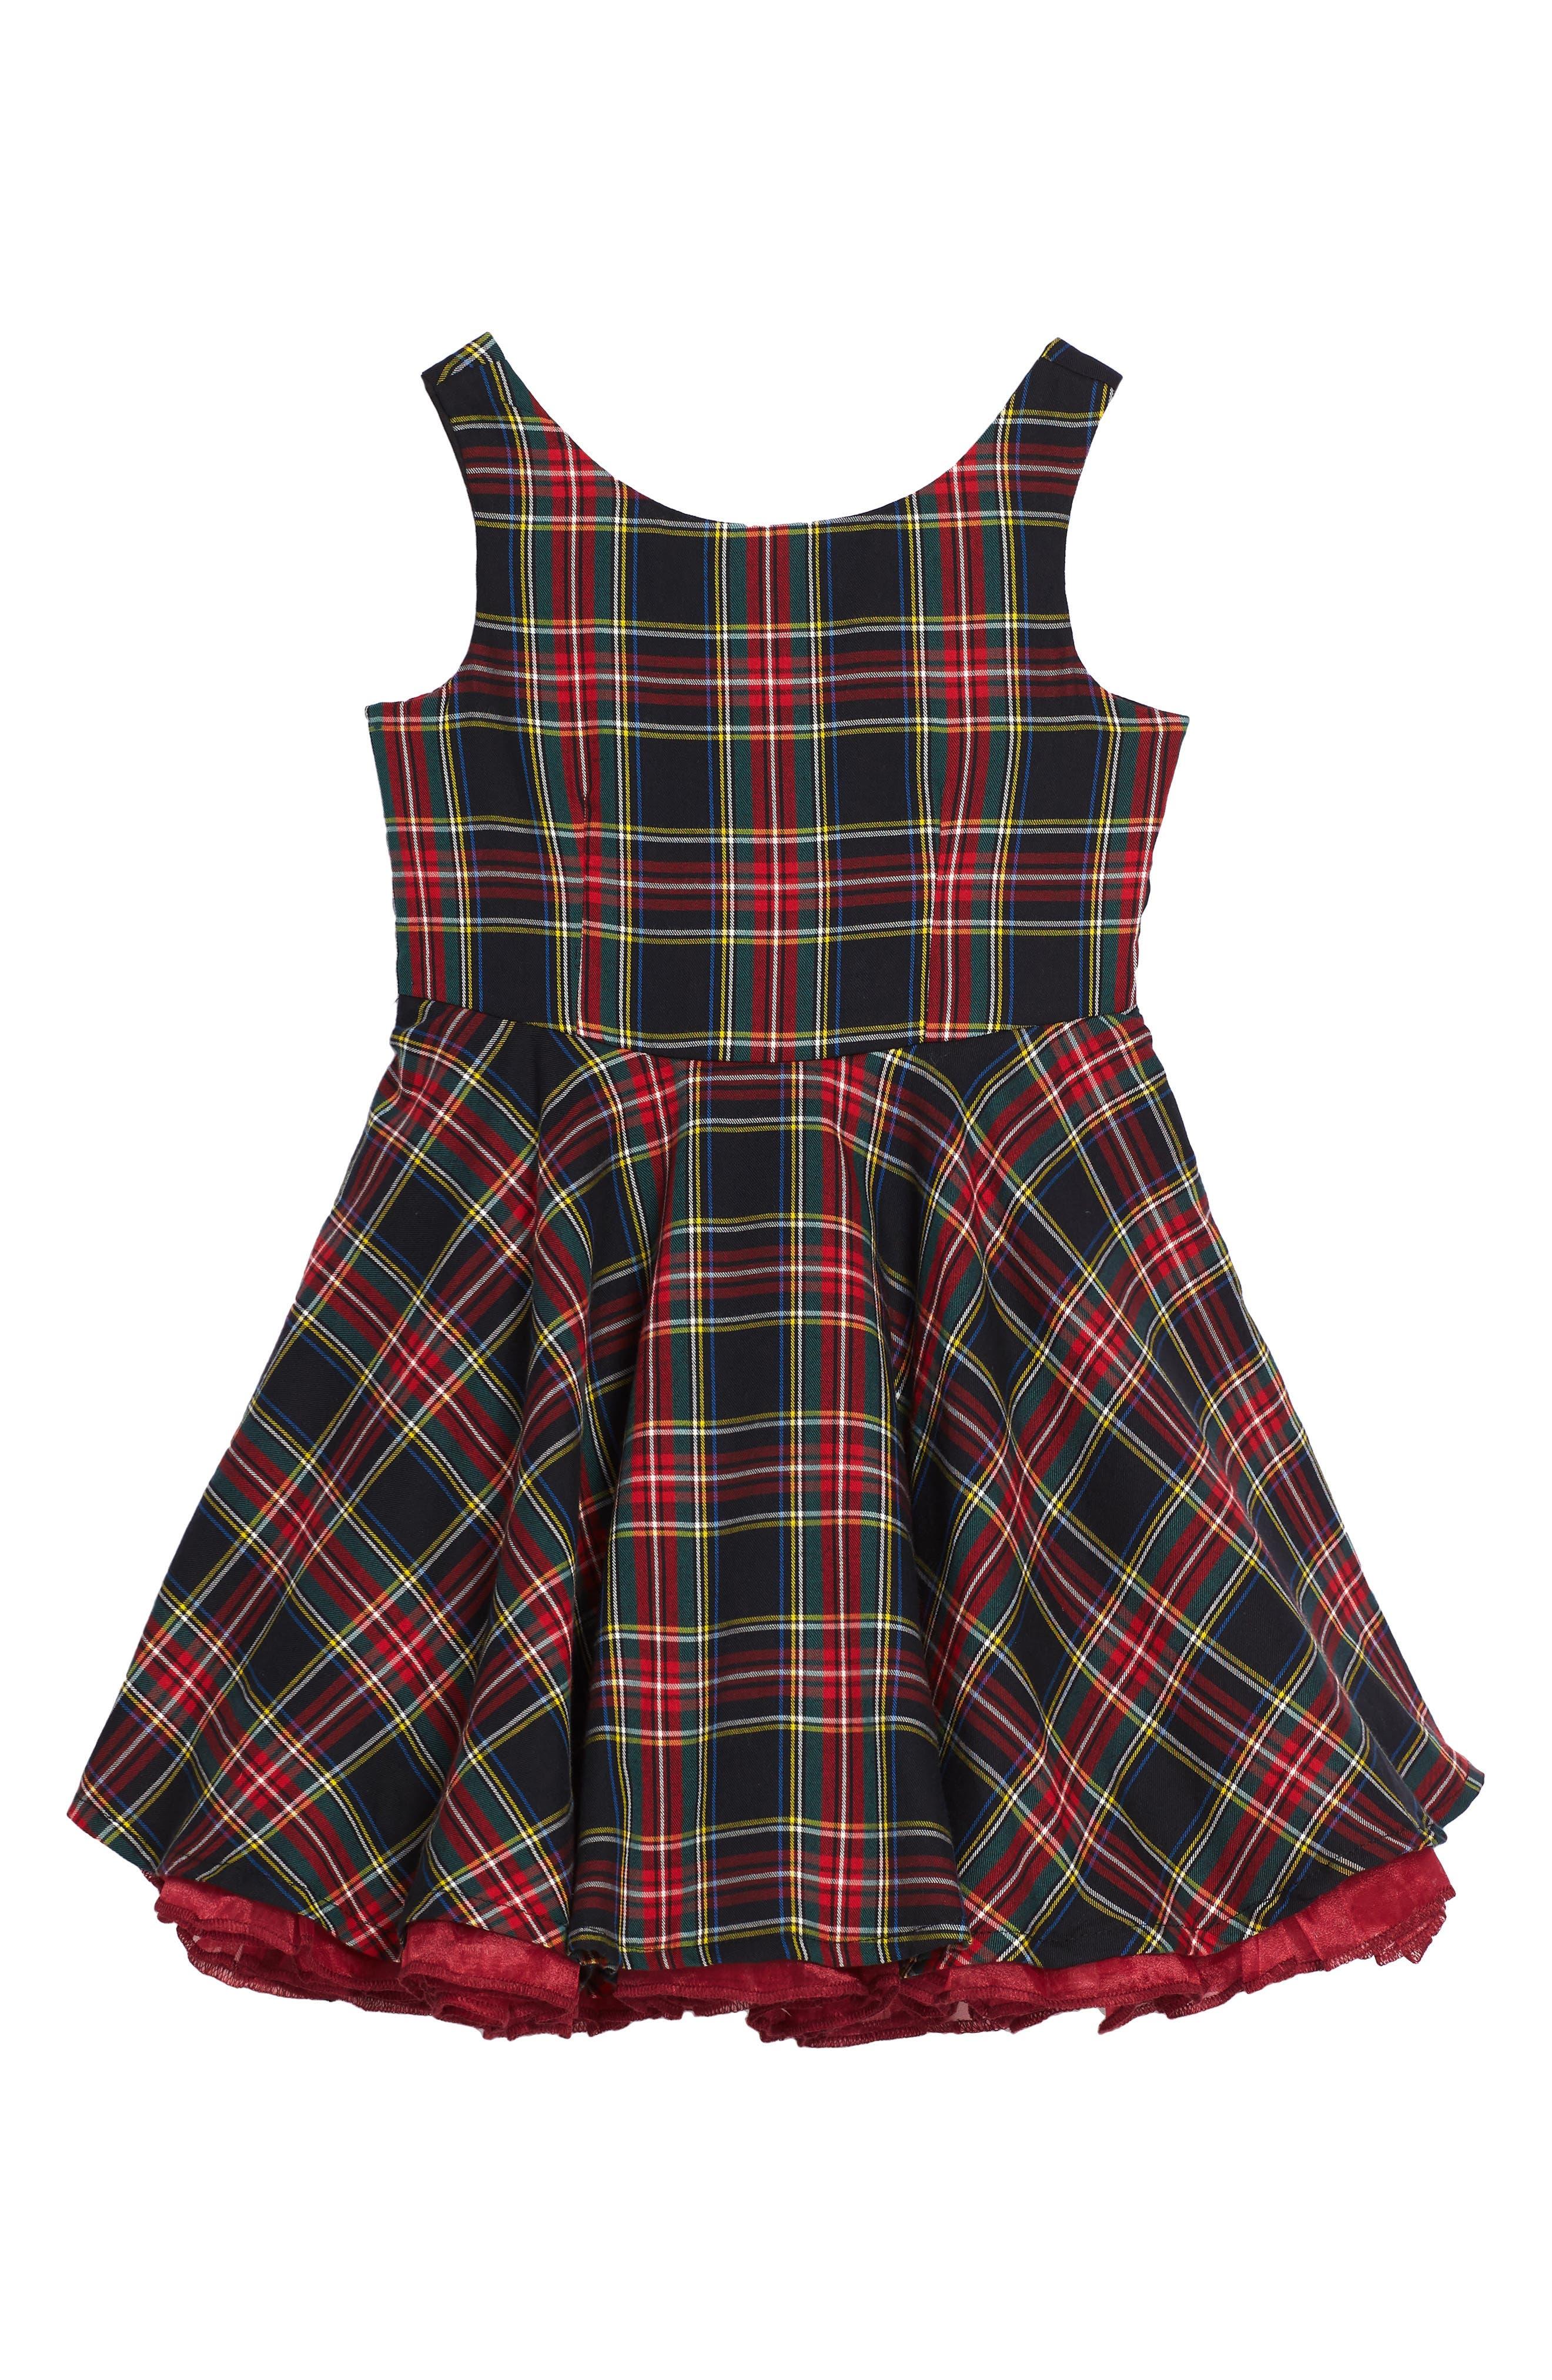 Alternate Image 1 Selected - Fiveloaves Twofish Tartan Party Dress (Toddler Girls & Little Girls)